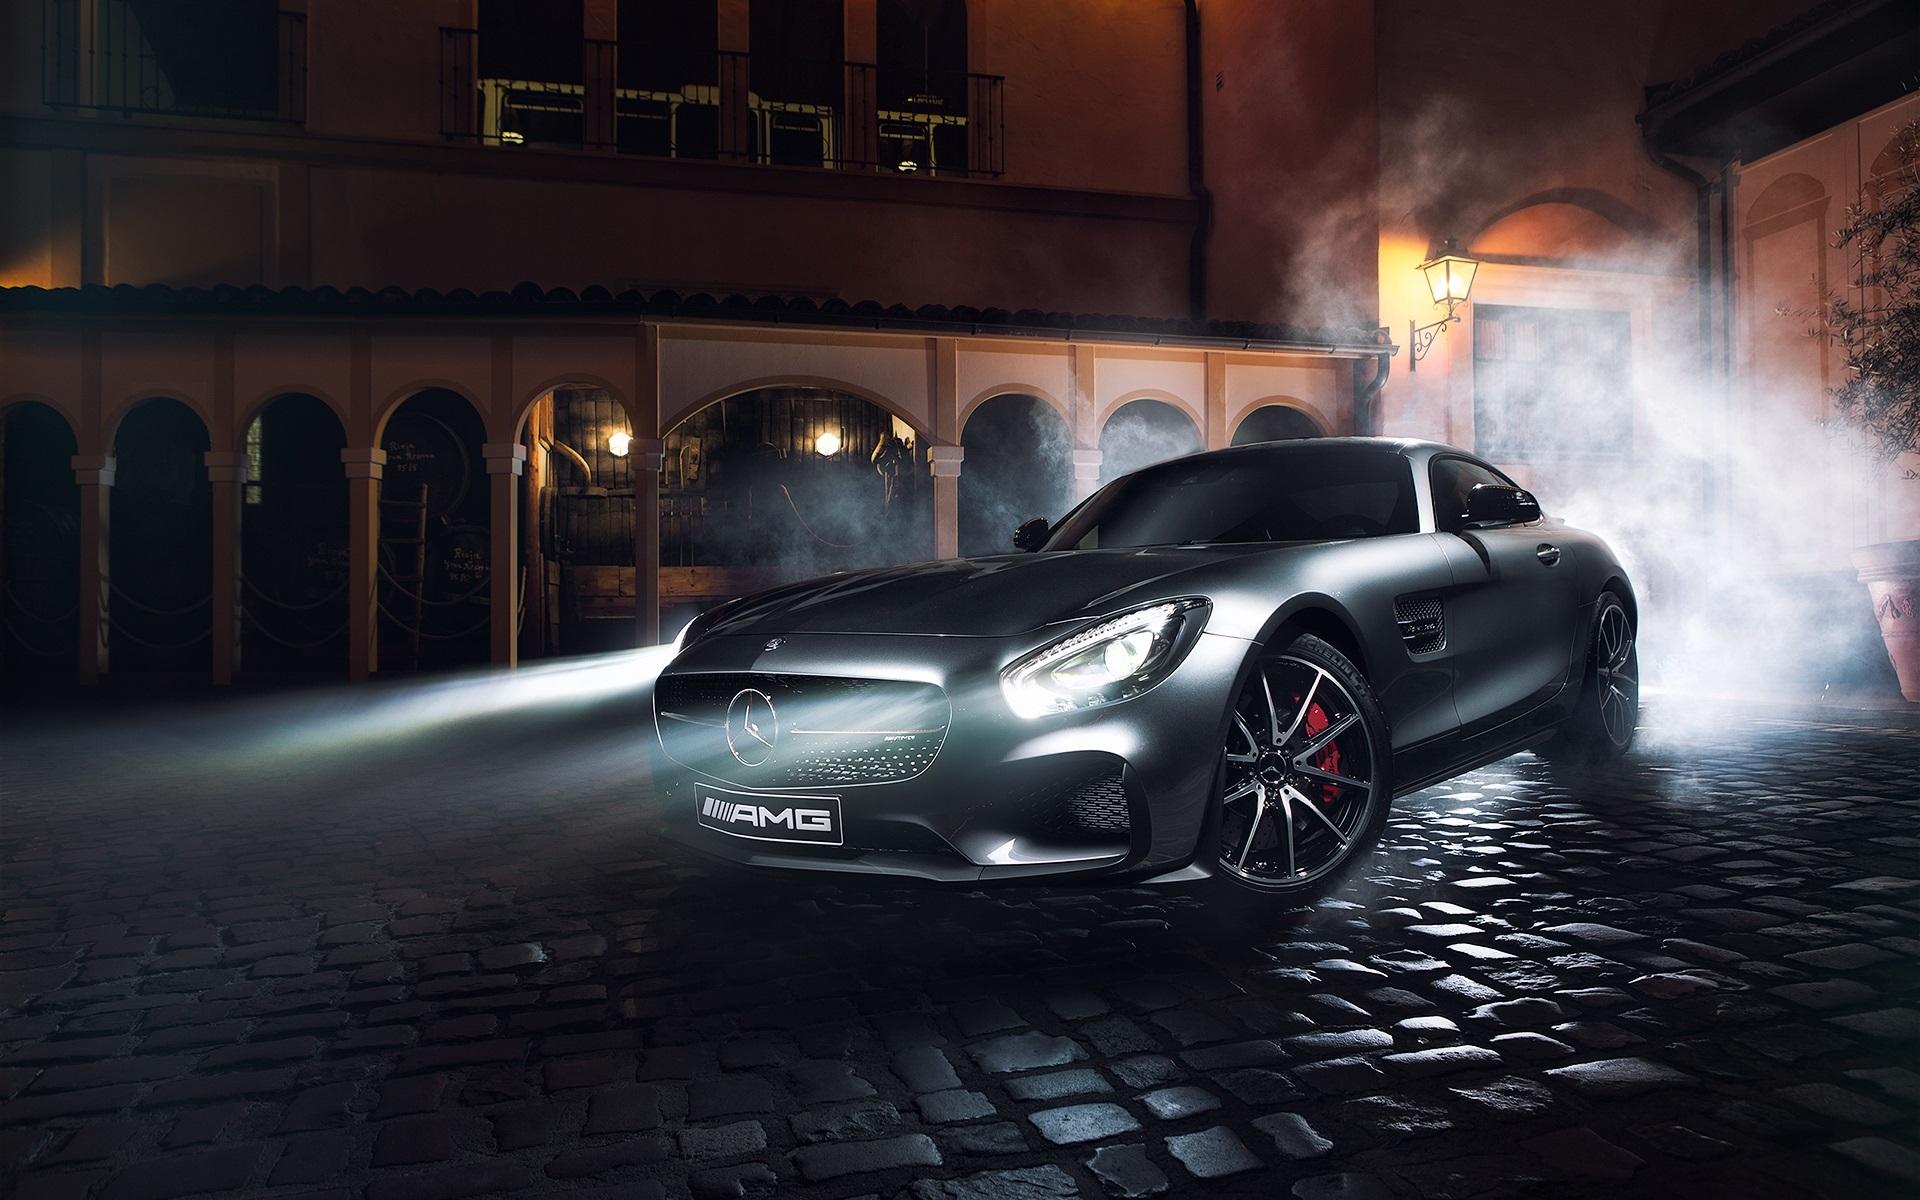 Mercedes Benz Amg Gt S Silber Supercar Nacht Licht Rauch